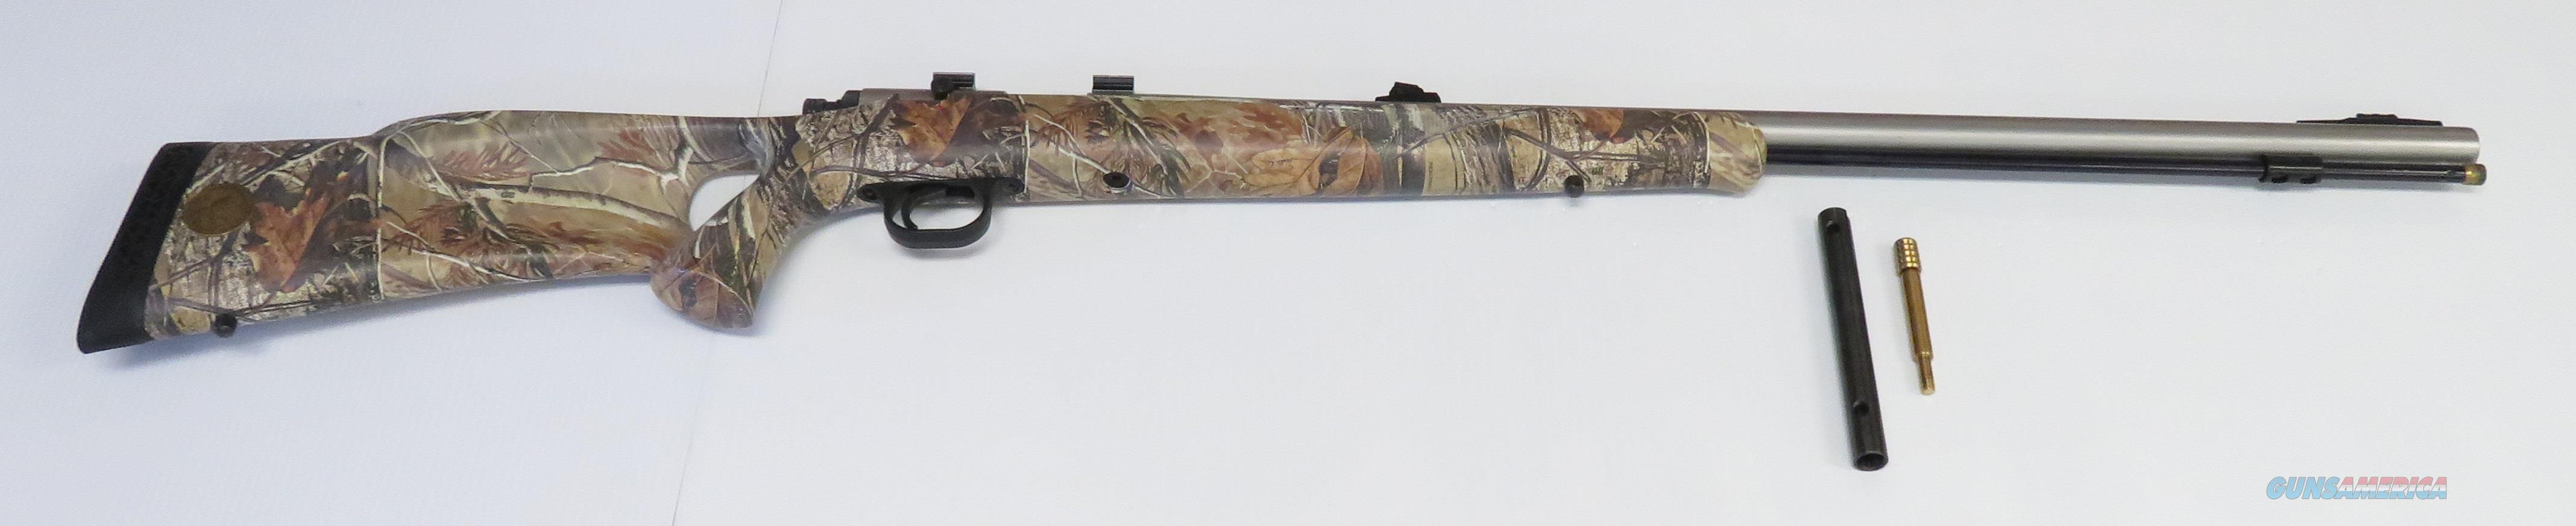 Knight Bighorn 50 Caliber Muzzleloader Thumbhole Woodland Camouflage Stock Scope Mounts  Guns > Rifles > Knight Rifles